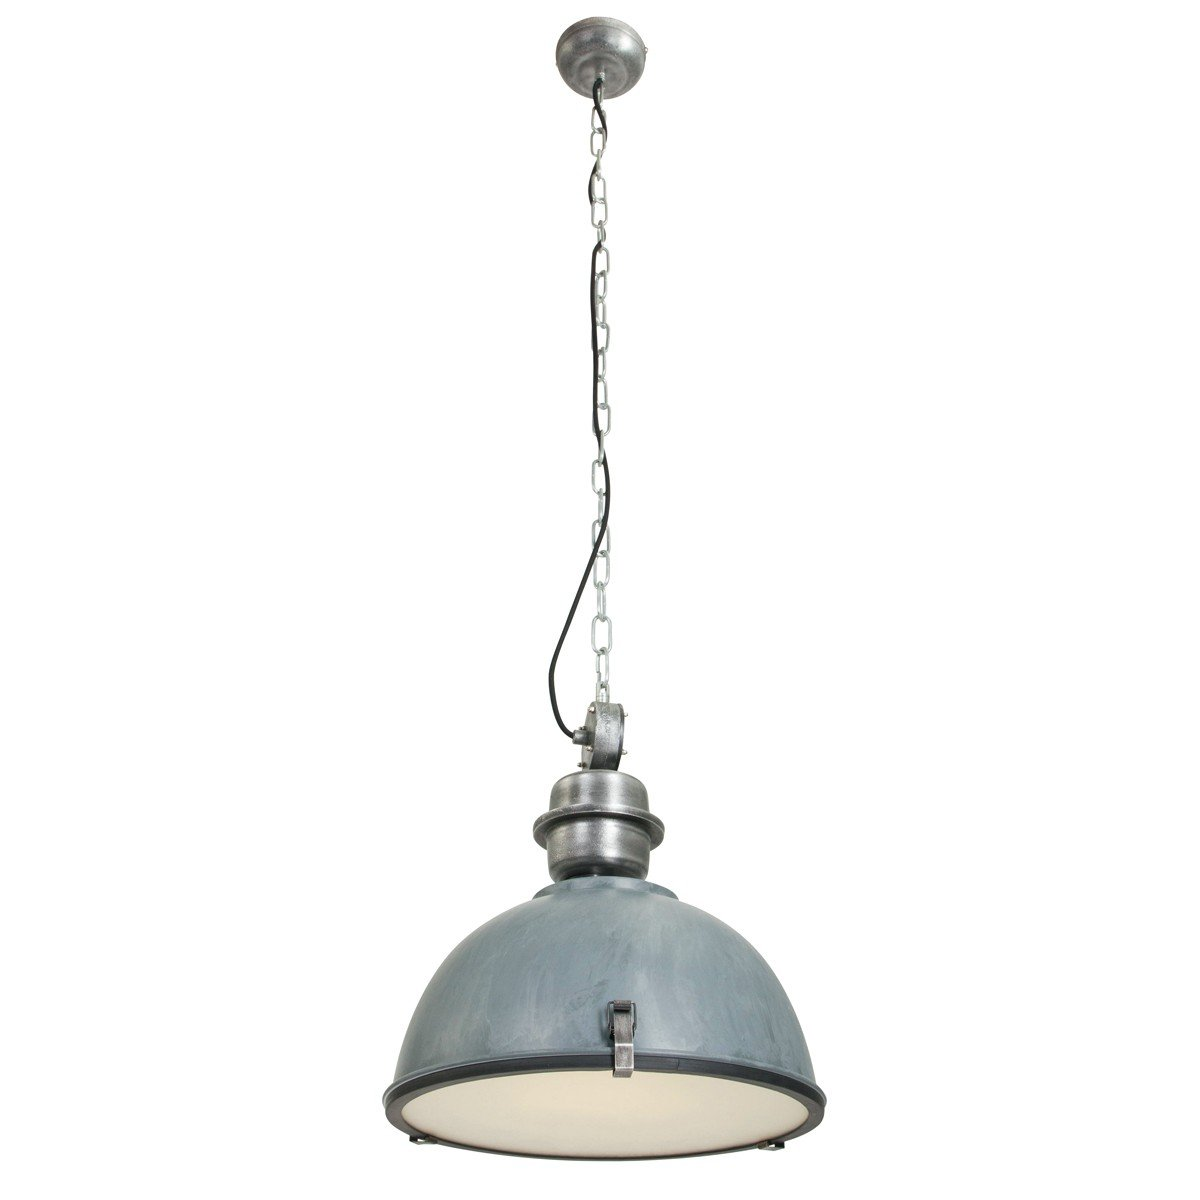 Hanglamp Steinhauer Bikkel 7586 Grijs